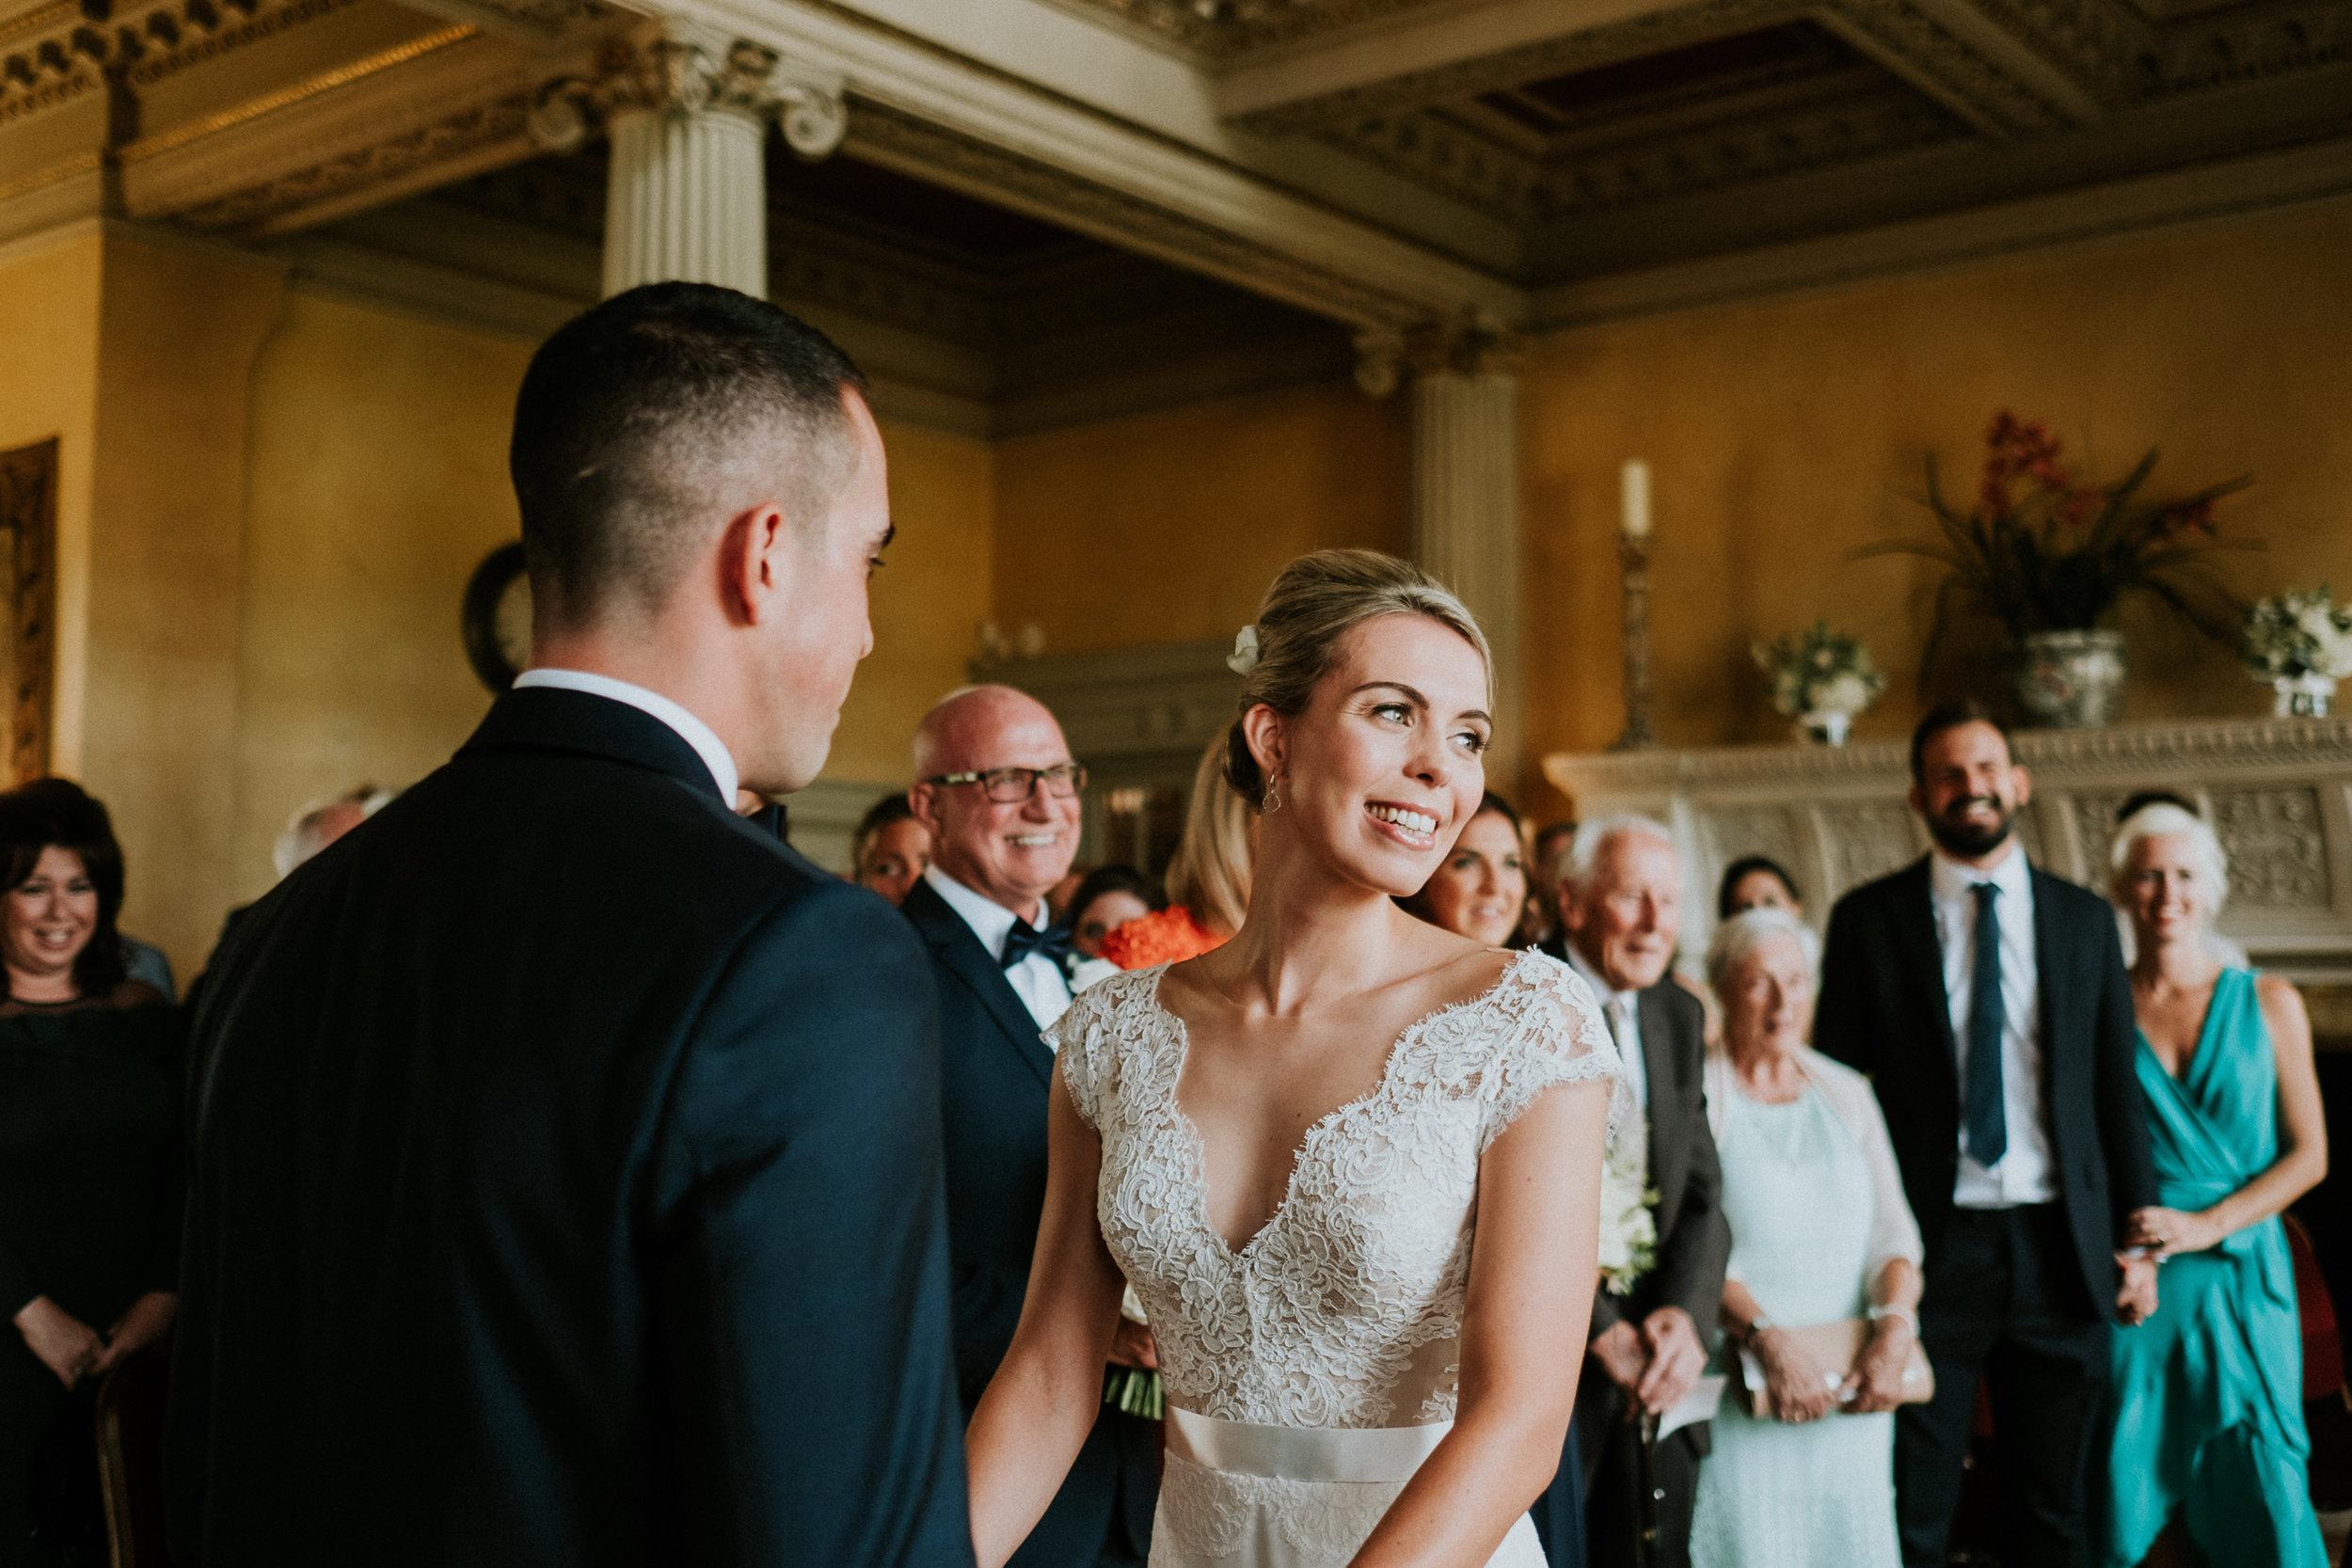 16 Hampton Court House wedding photographer Creative Fun Joanna Nicole Photography.jpg